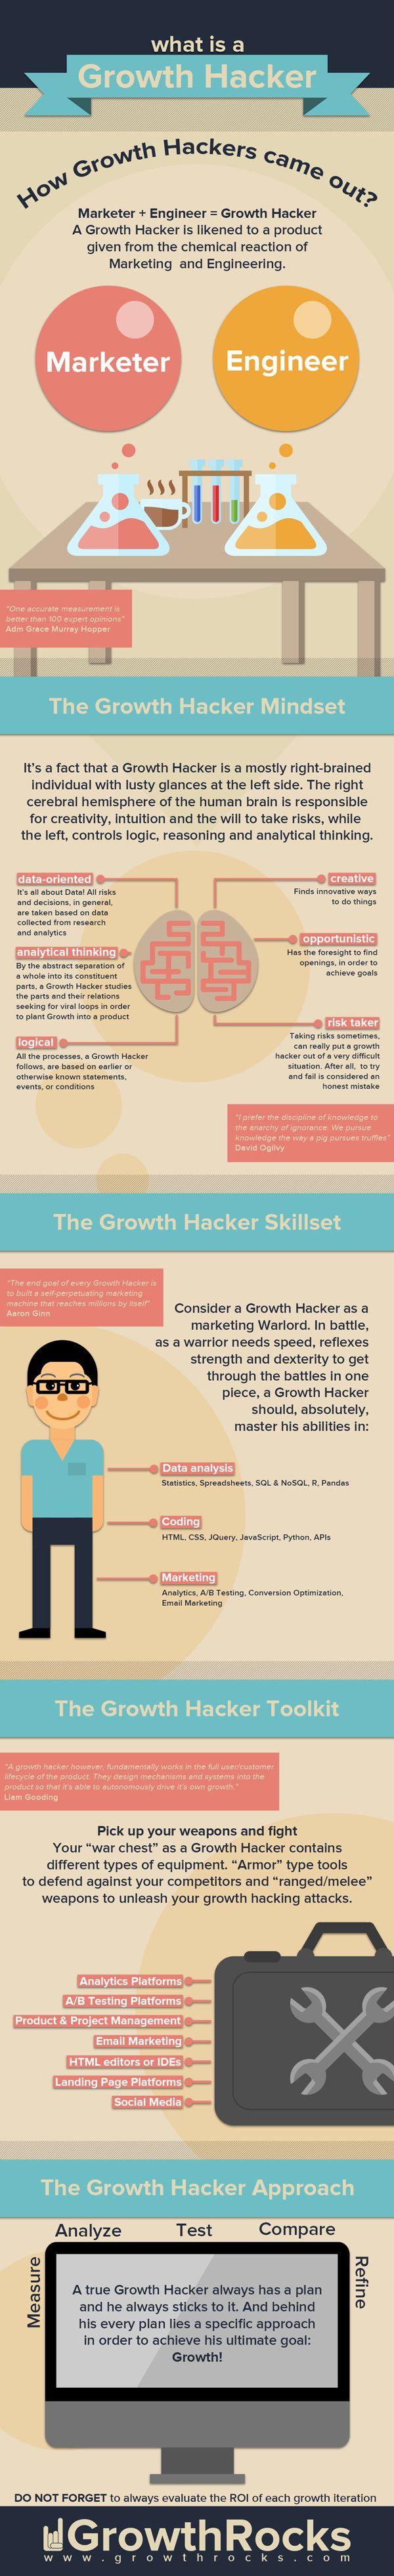 Todd Lohenry growth hacker